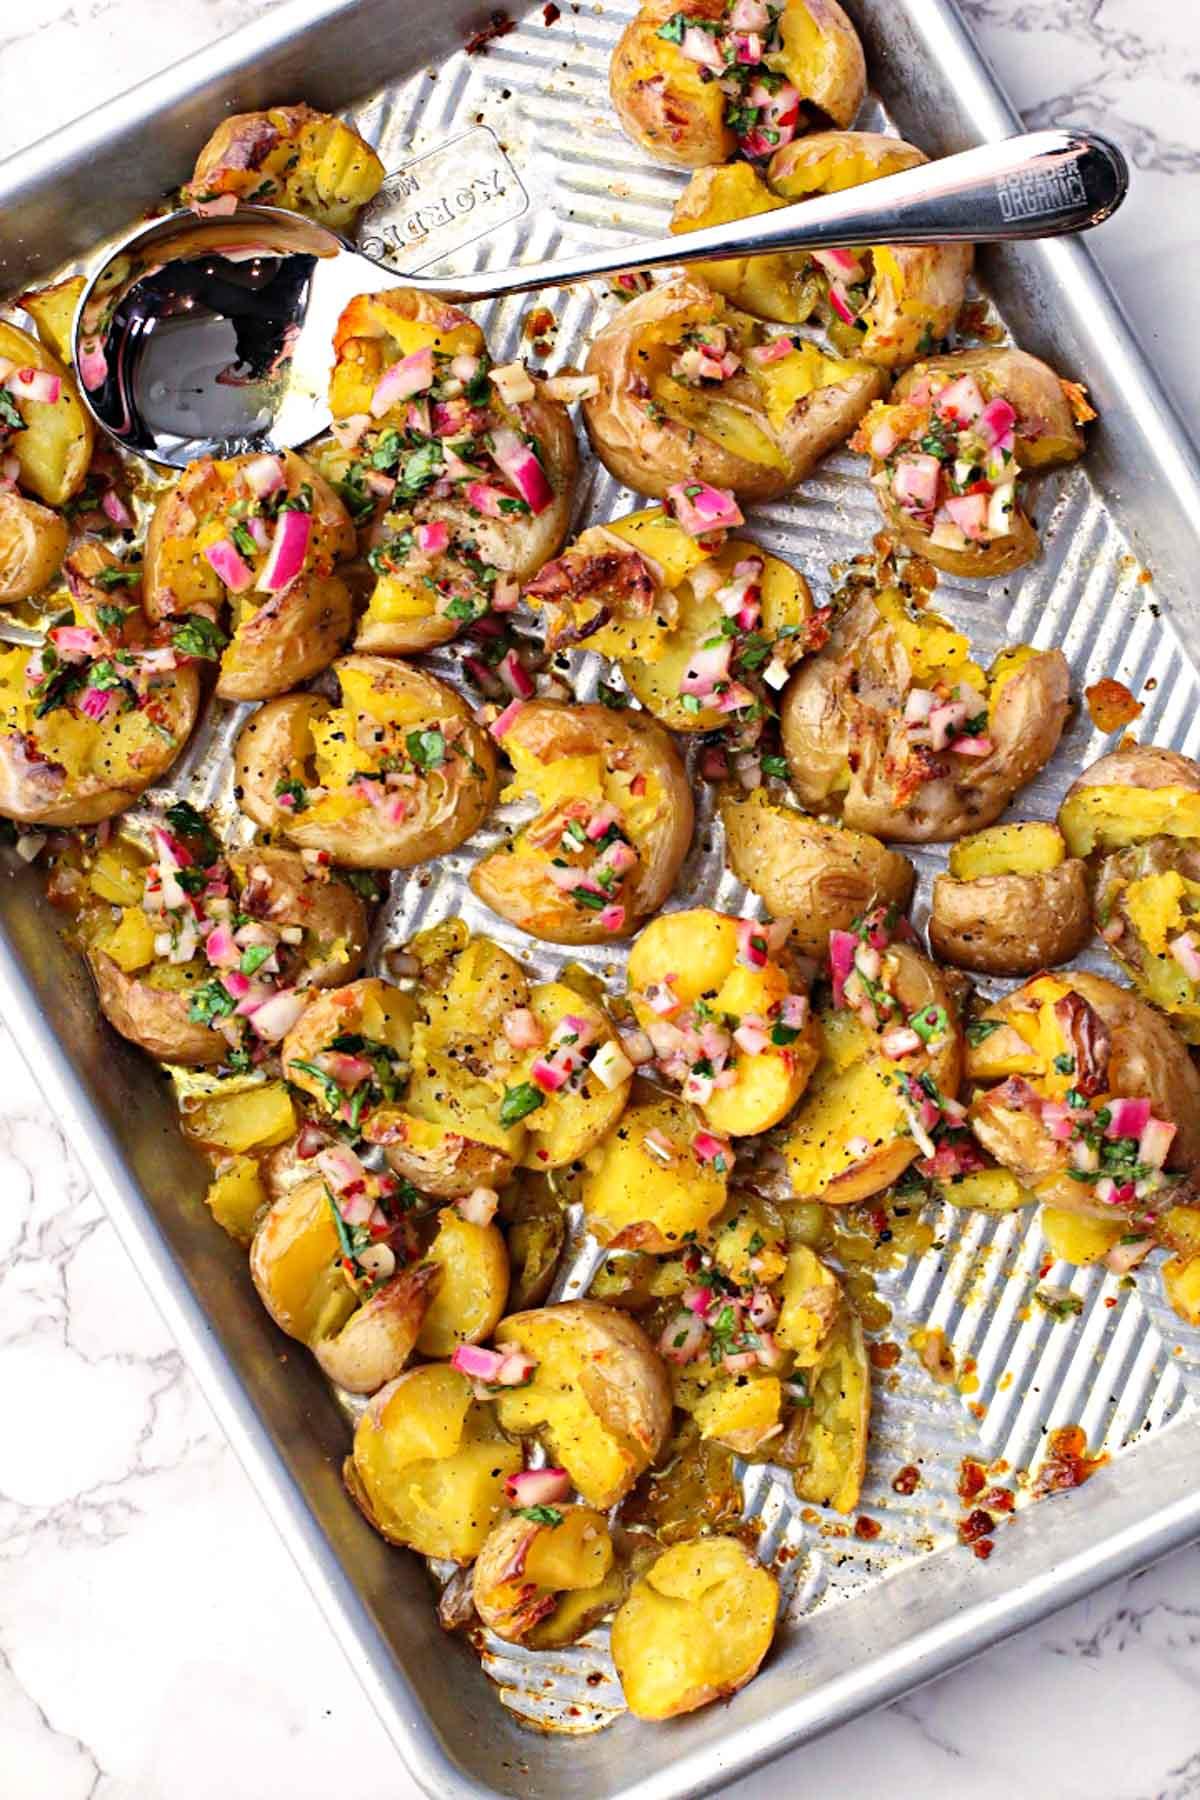 Smashed yukon gold potatoes with chimichurri sauce on a sheet pan